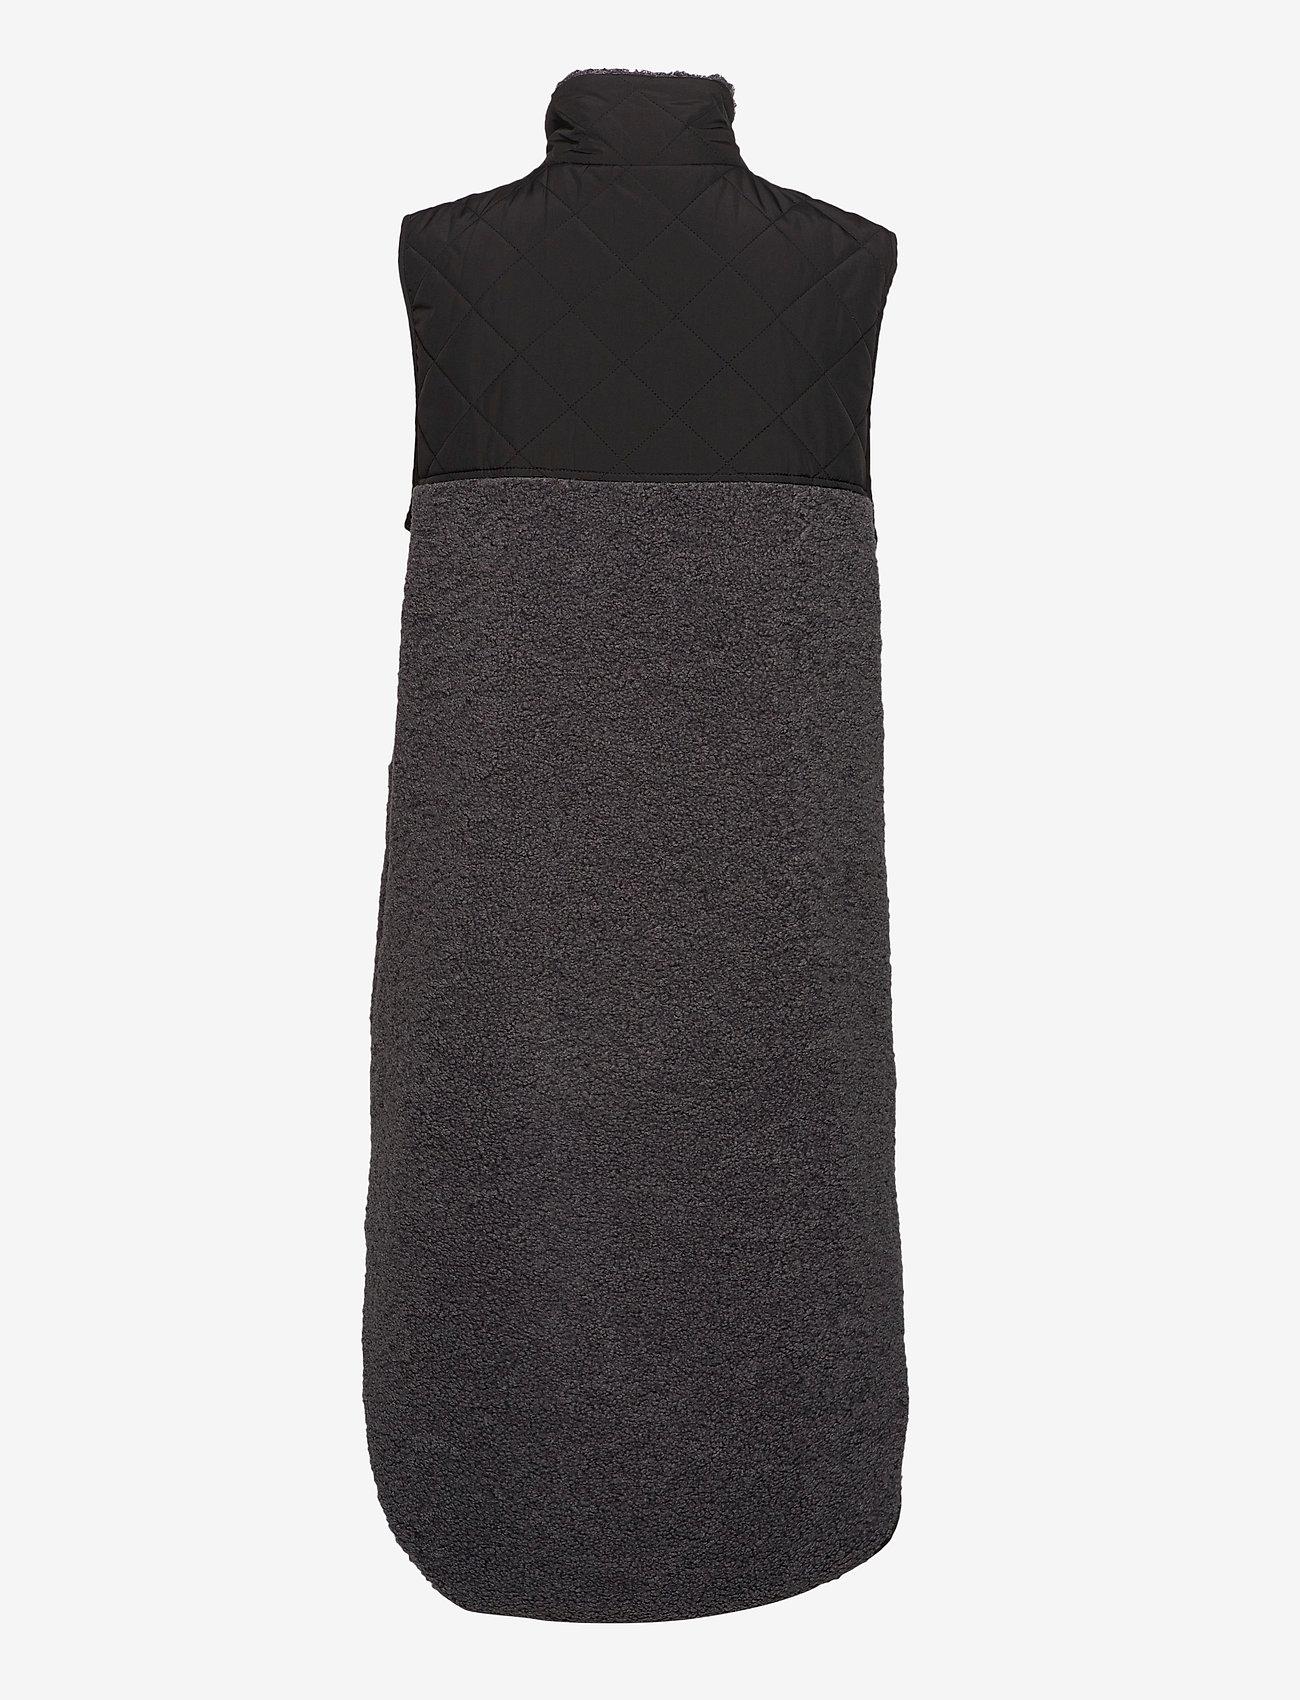 Global Funk - Raima - knitted vests - grey black mix - 1